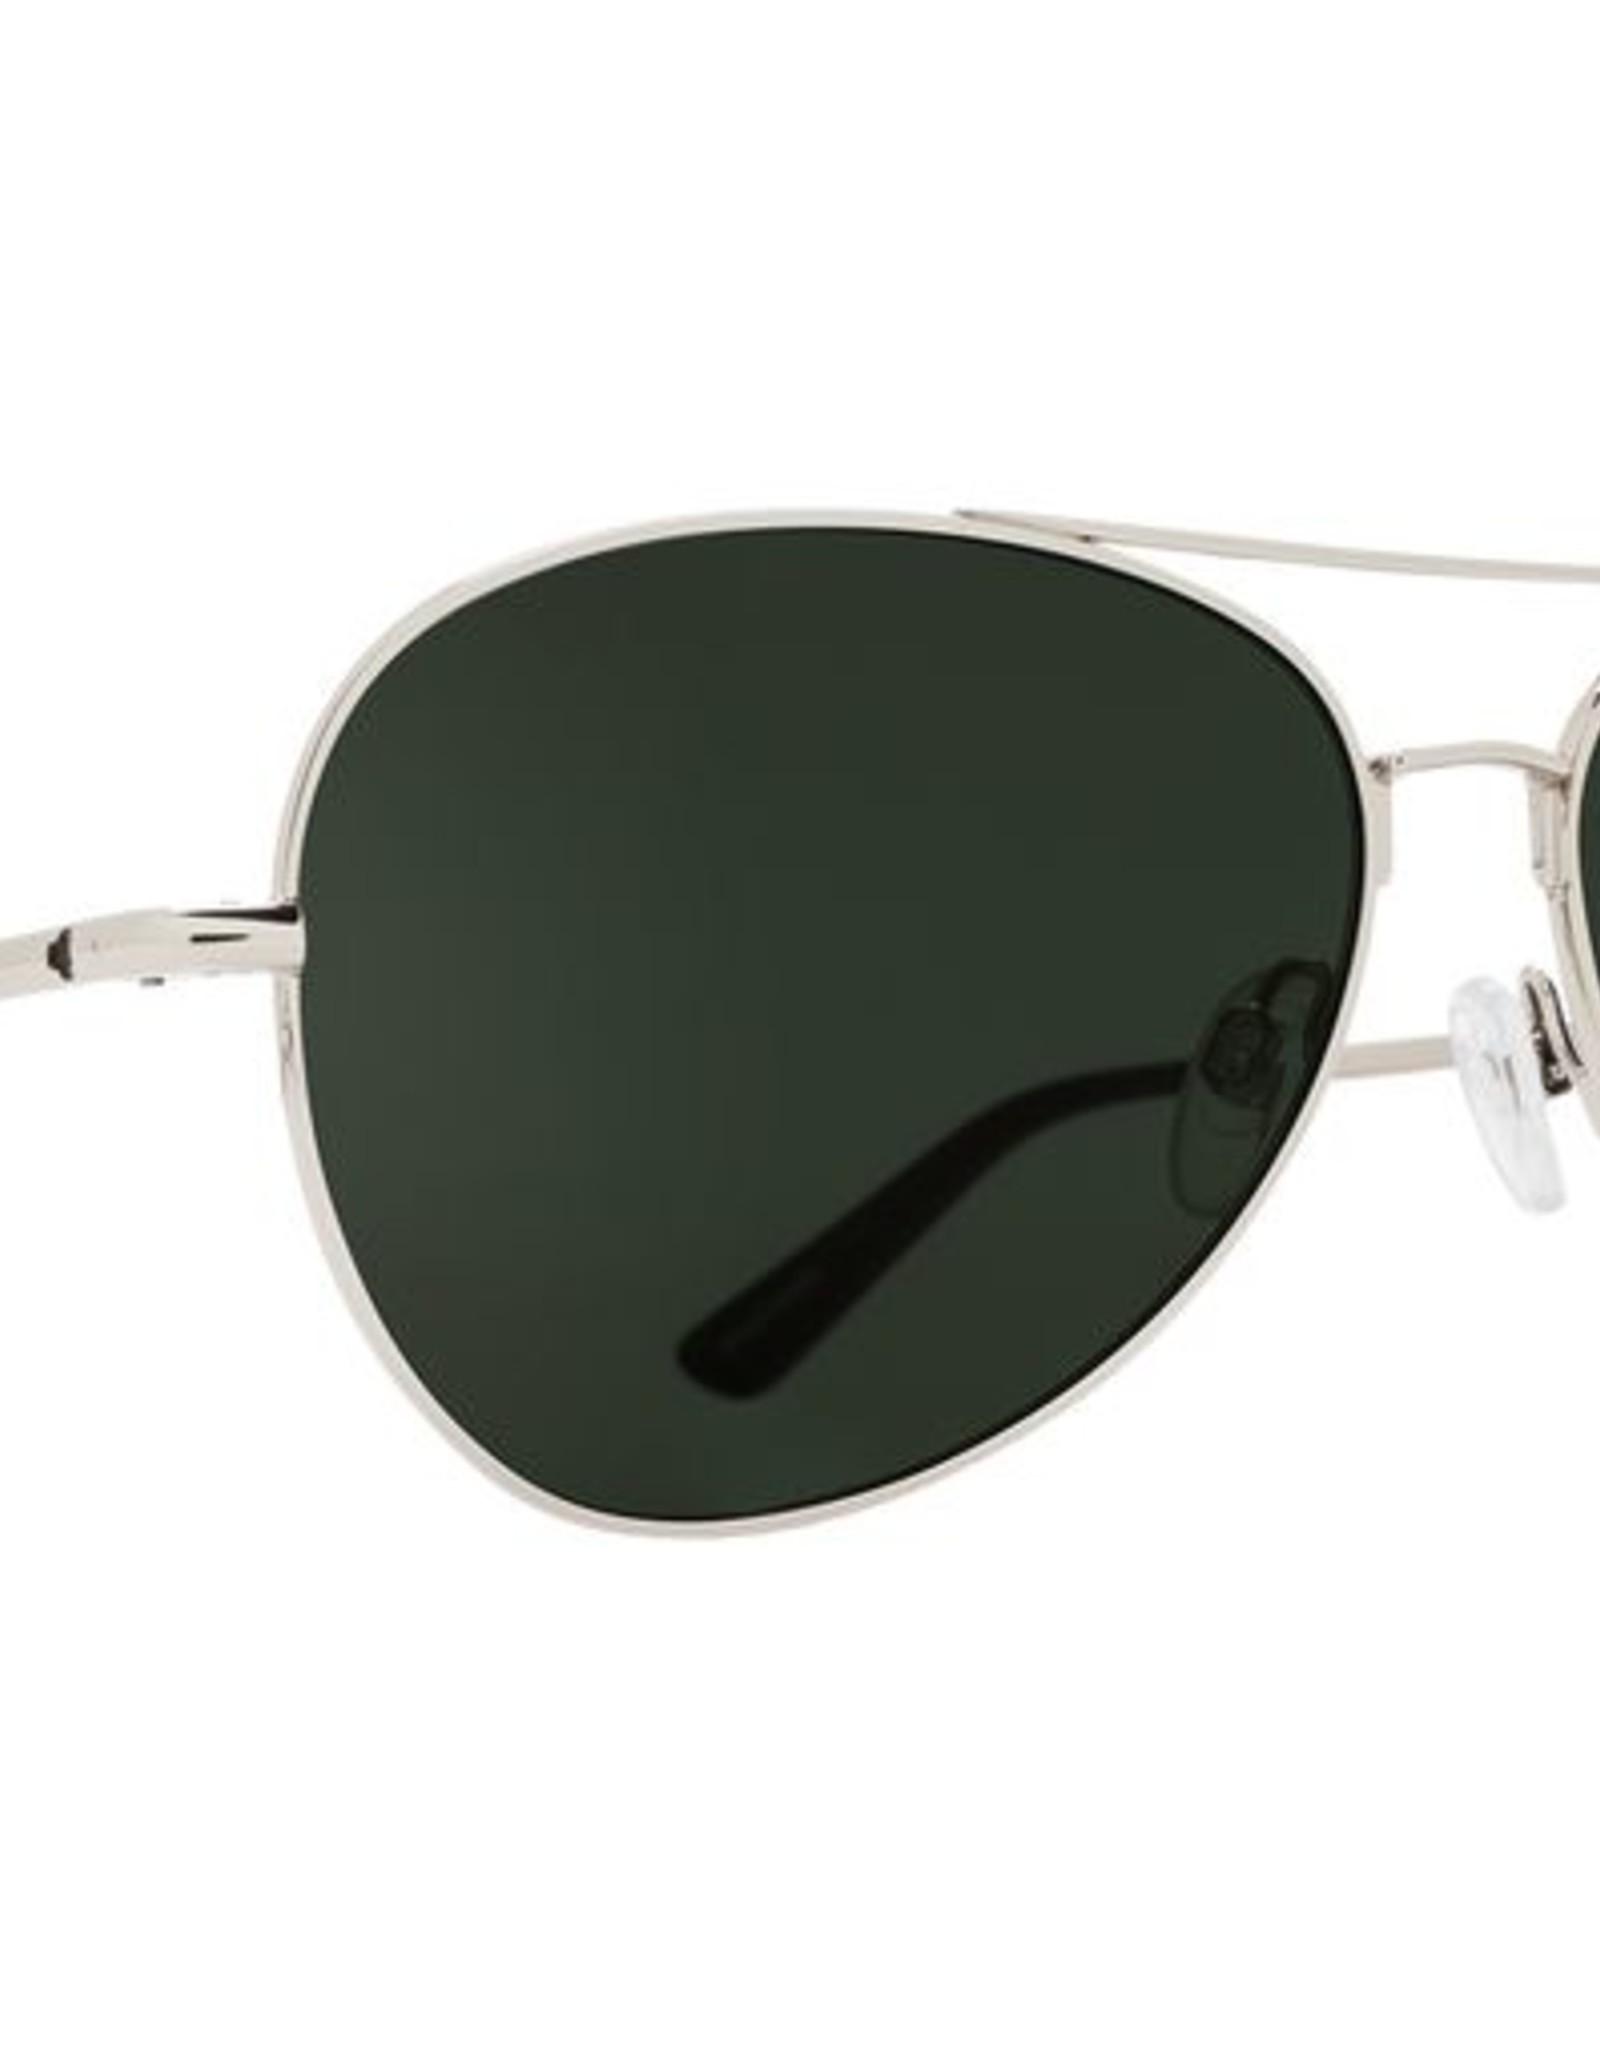 SPY Spy - WHISTLER - Silver w/ POLAR Happy Gray Green